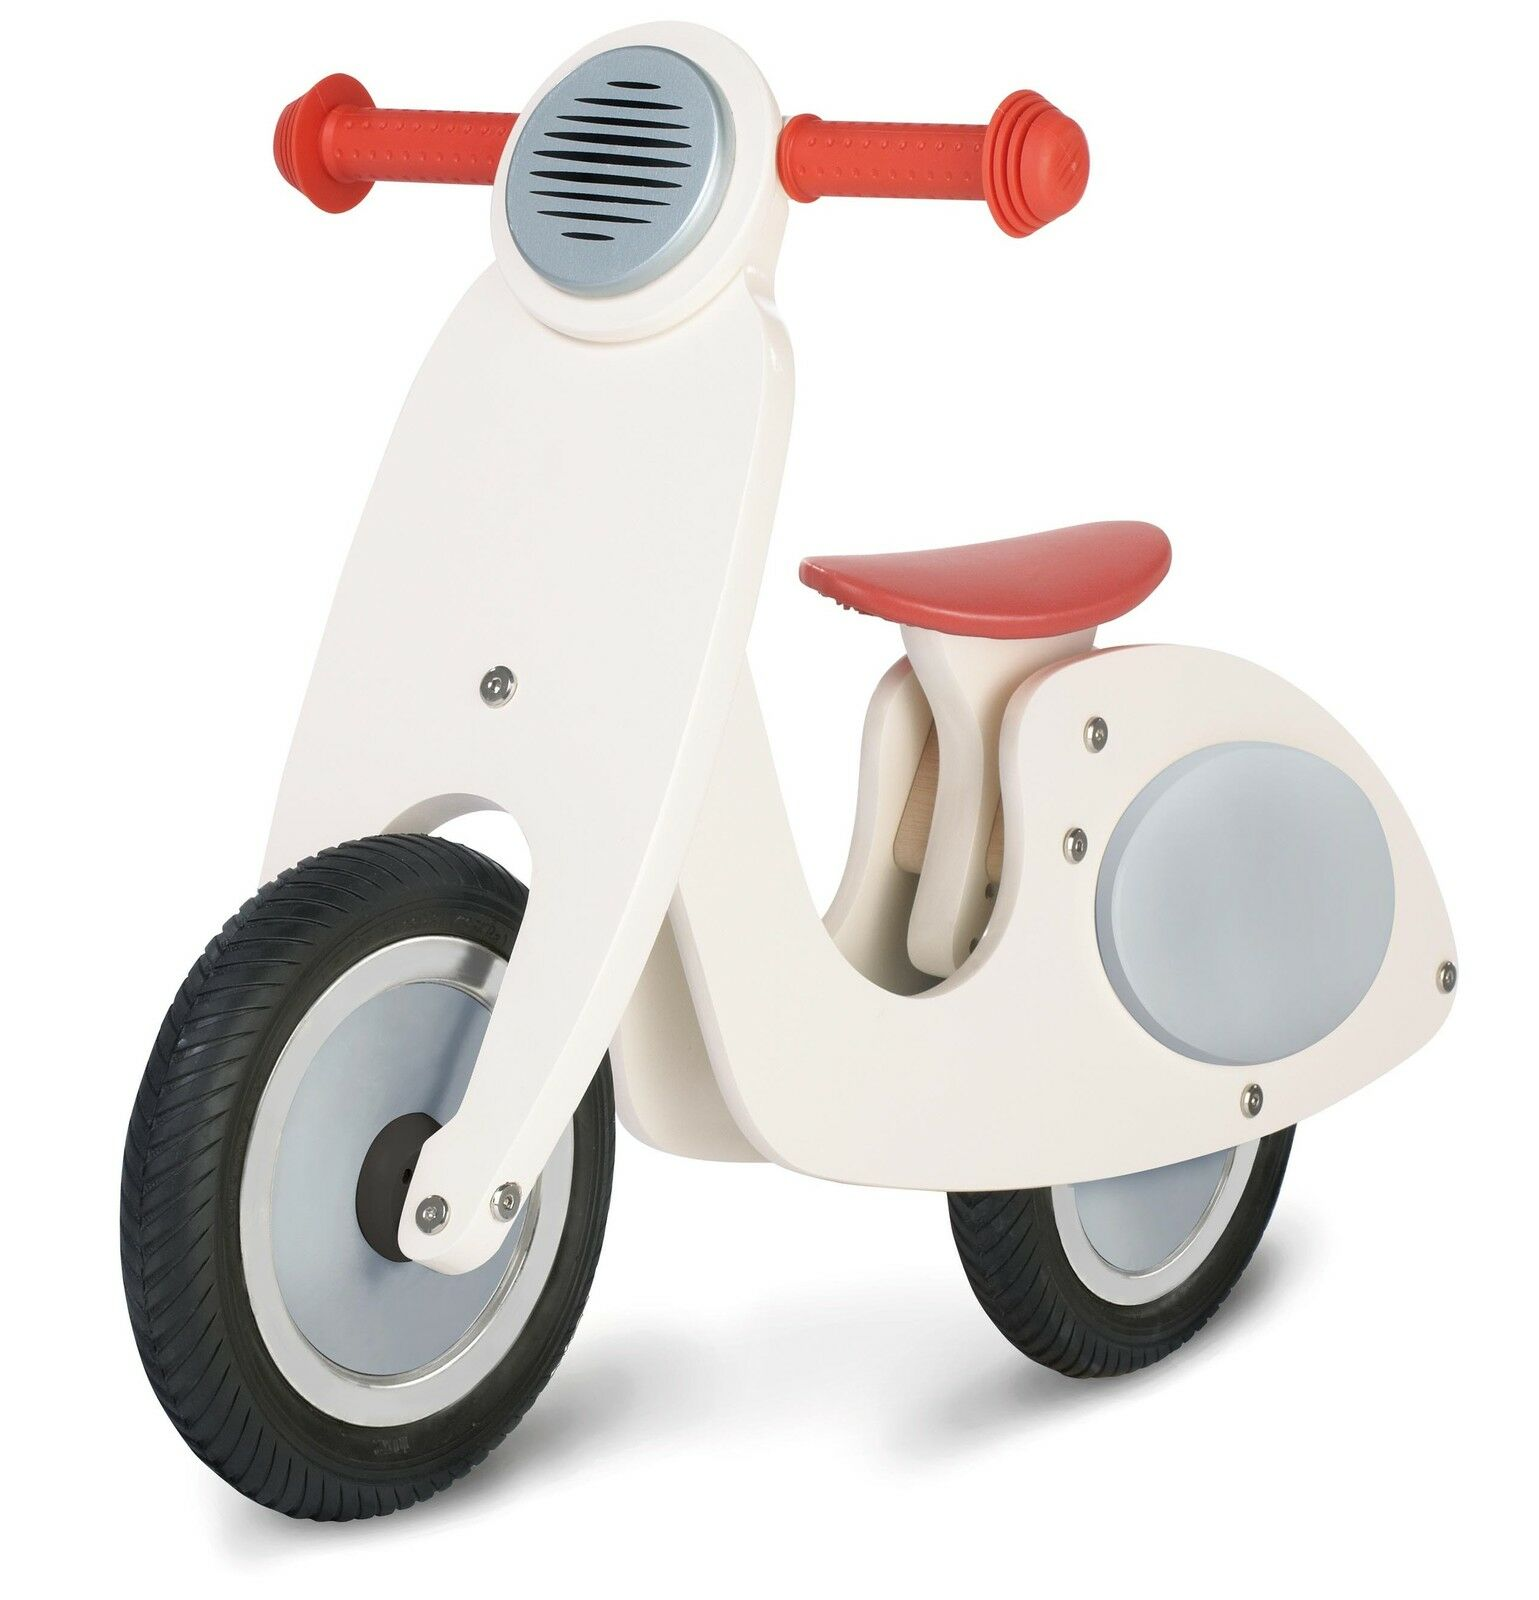 Laufrad Pinolino Vespa Wanda Weiss Holz Kinderlaufrad Kinderrad Zweirad Rad Neu